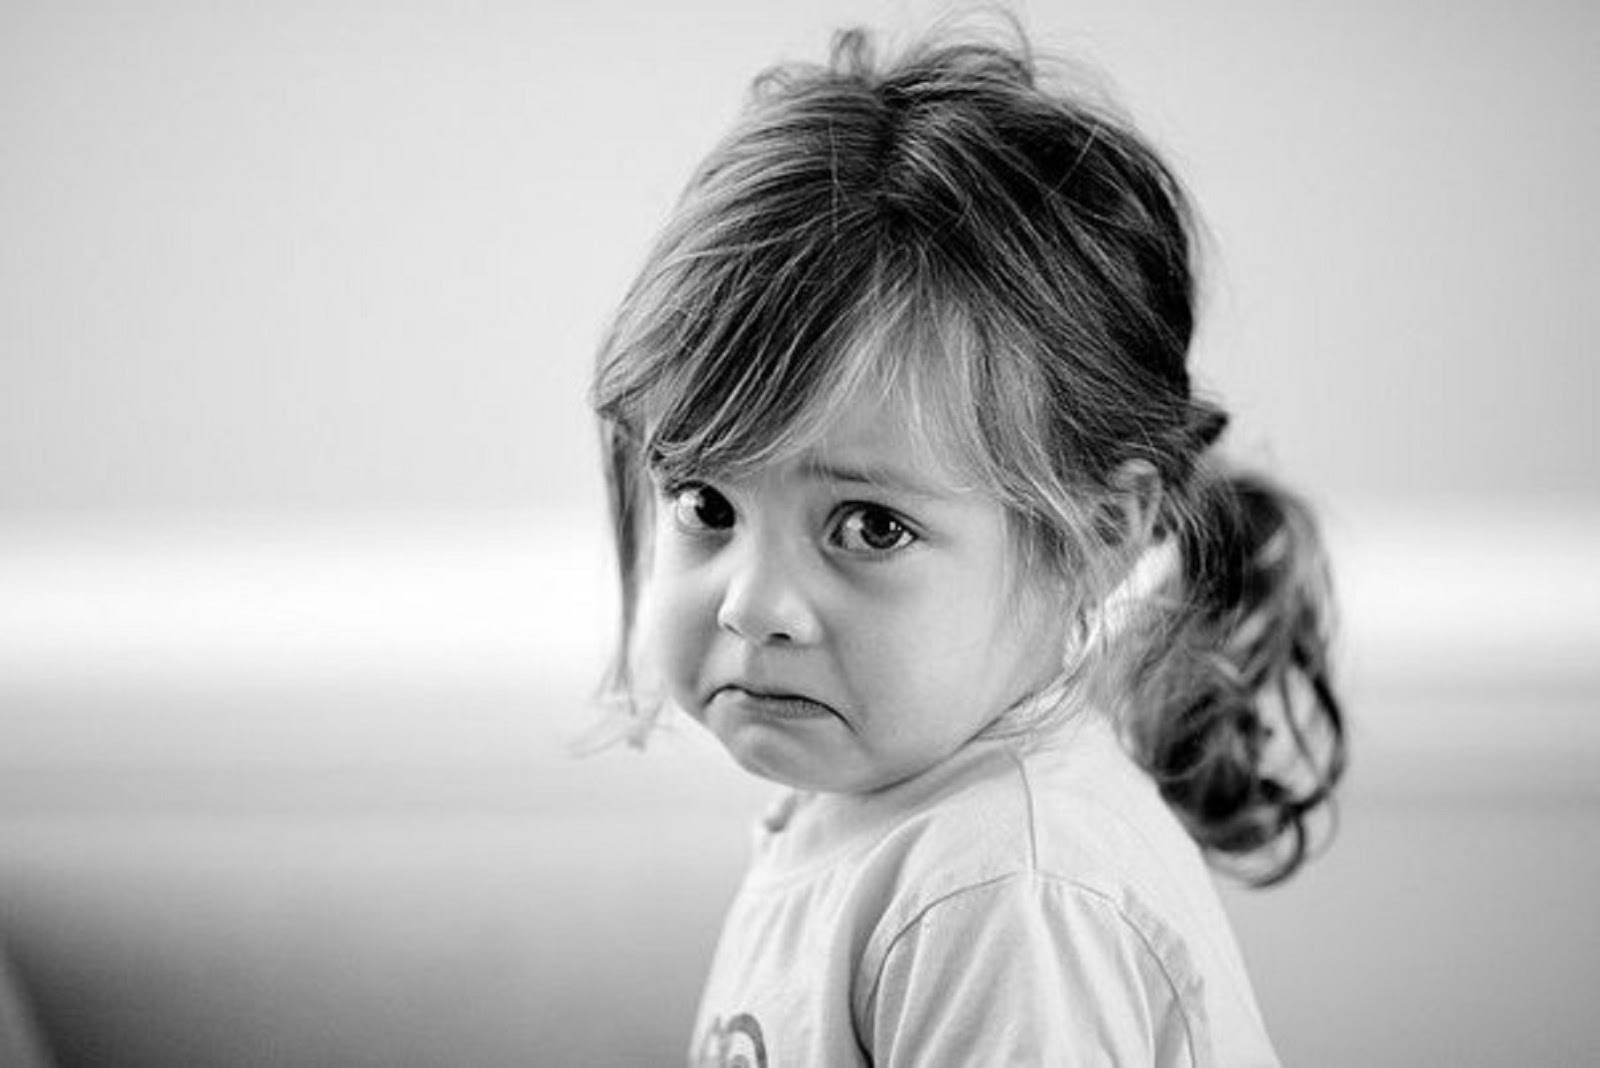 Марта, картинки обидели девочку